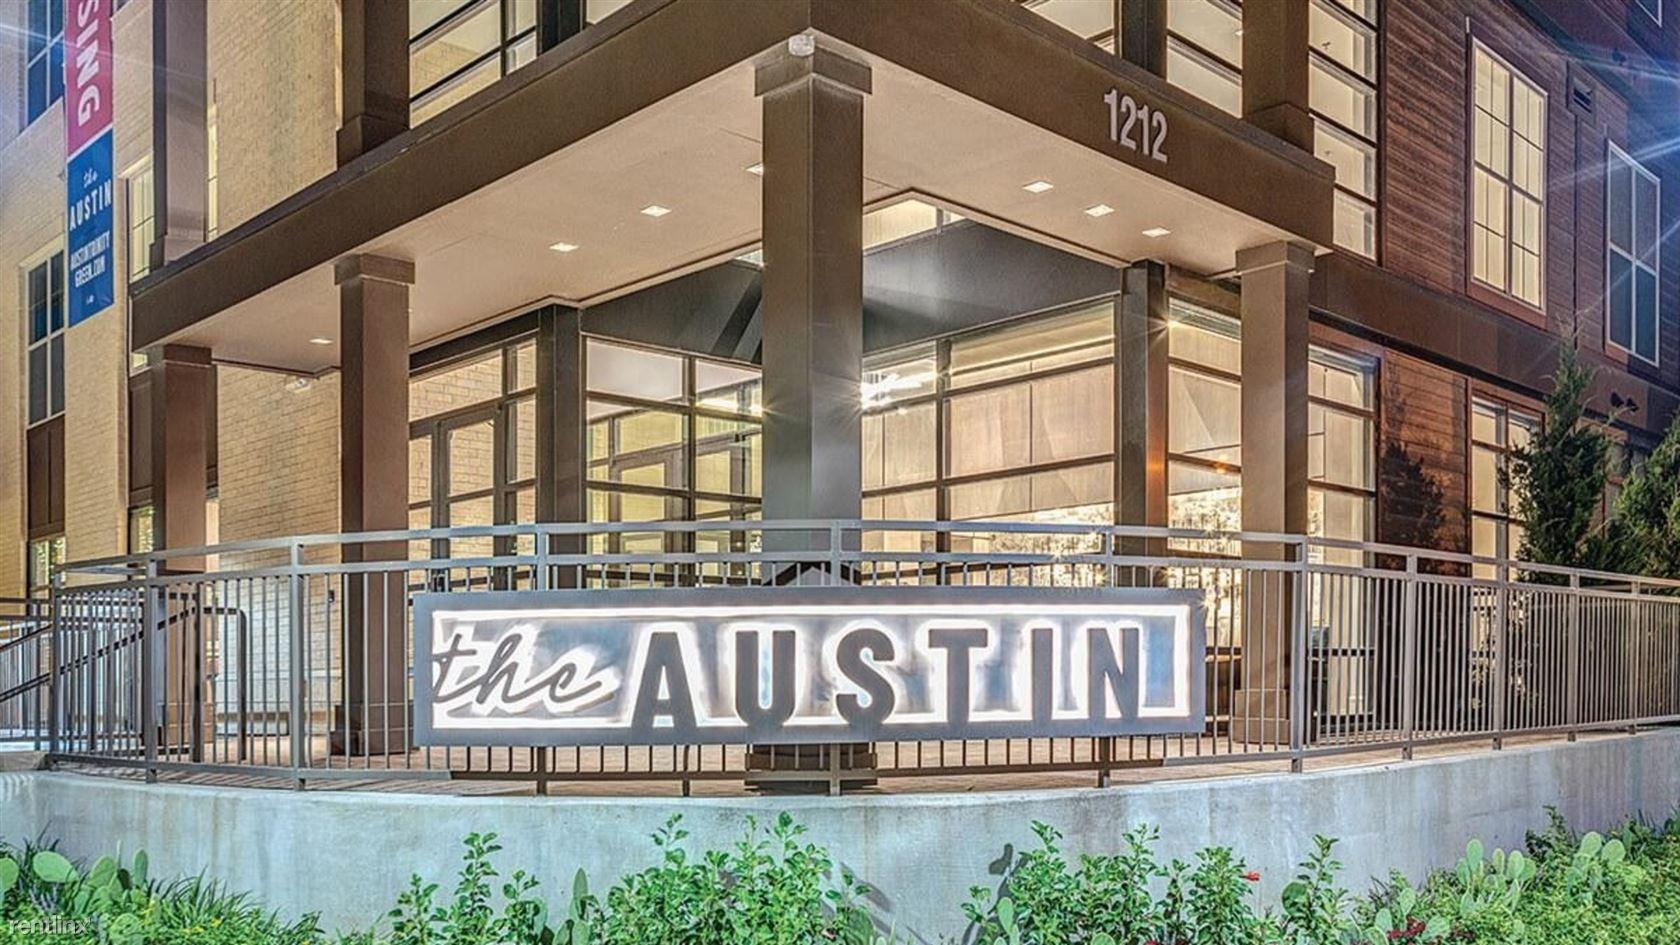 1212 Singleton Blvd, Dallas, TX - $2,228 USD/ month